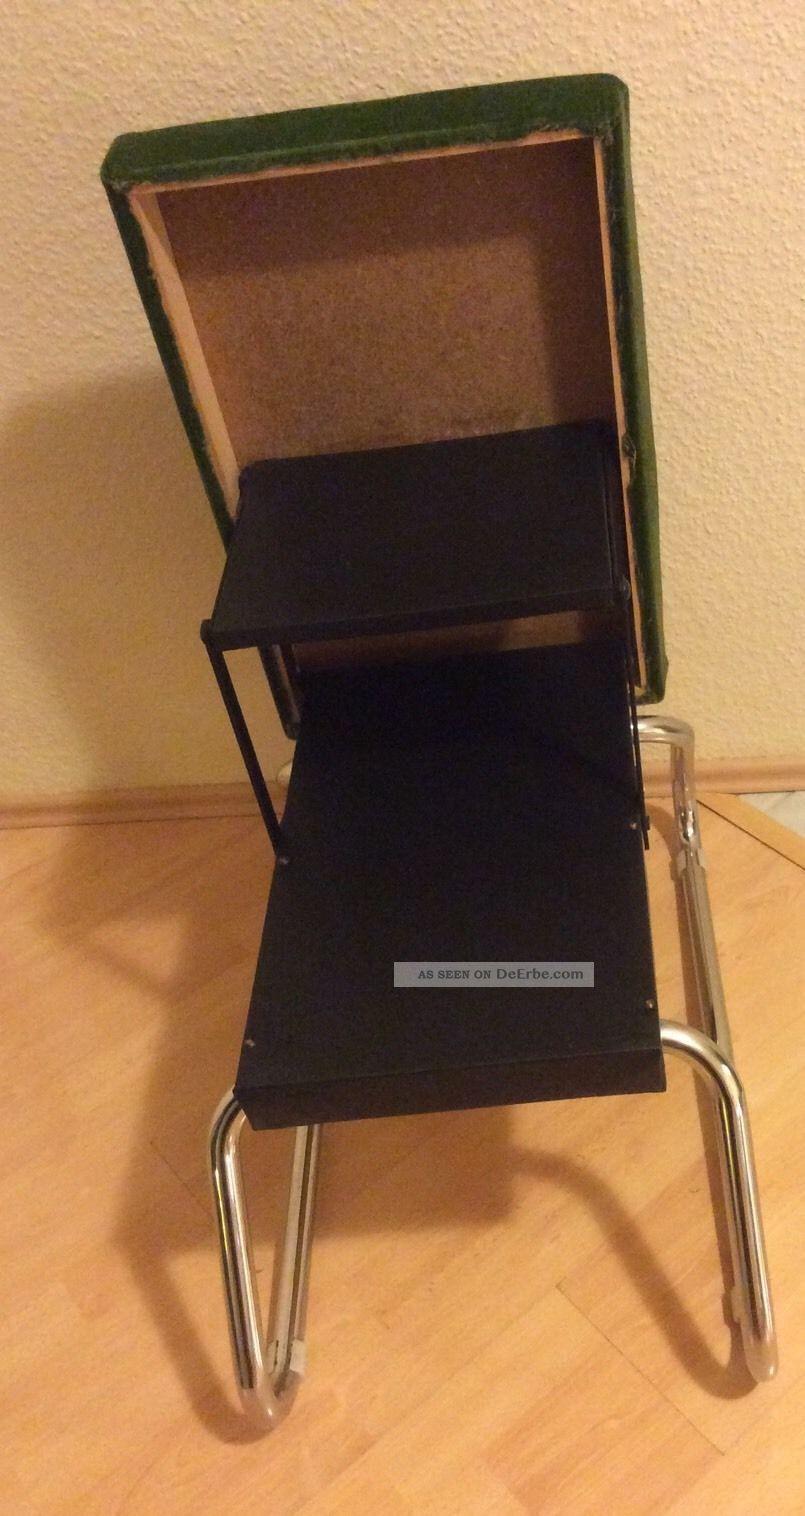 70er jahre hocker tritt mit leiter pl schhocker gr n chrome space age design. Black Bedroom Furniture Sets. Home Design Ideas